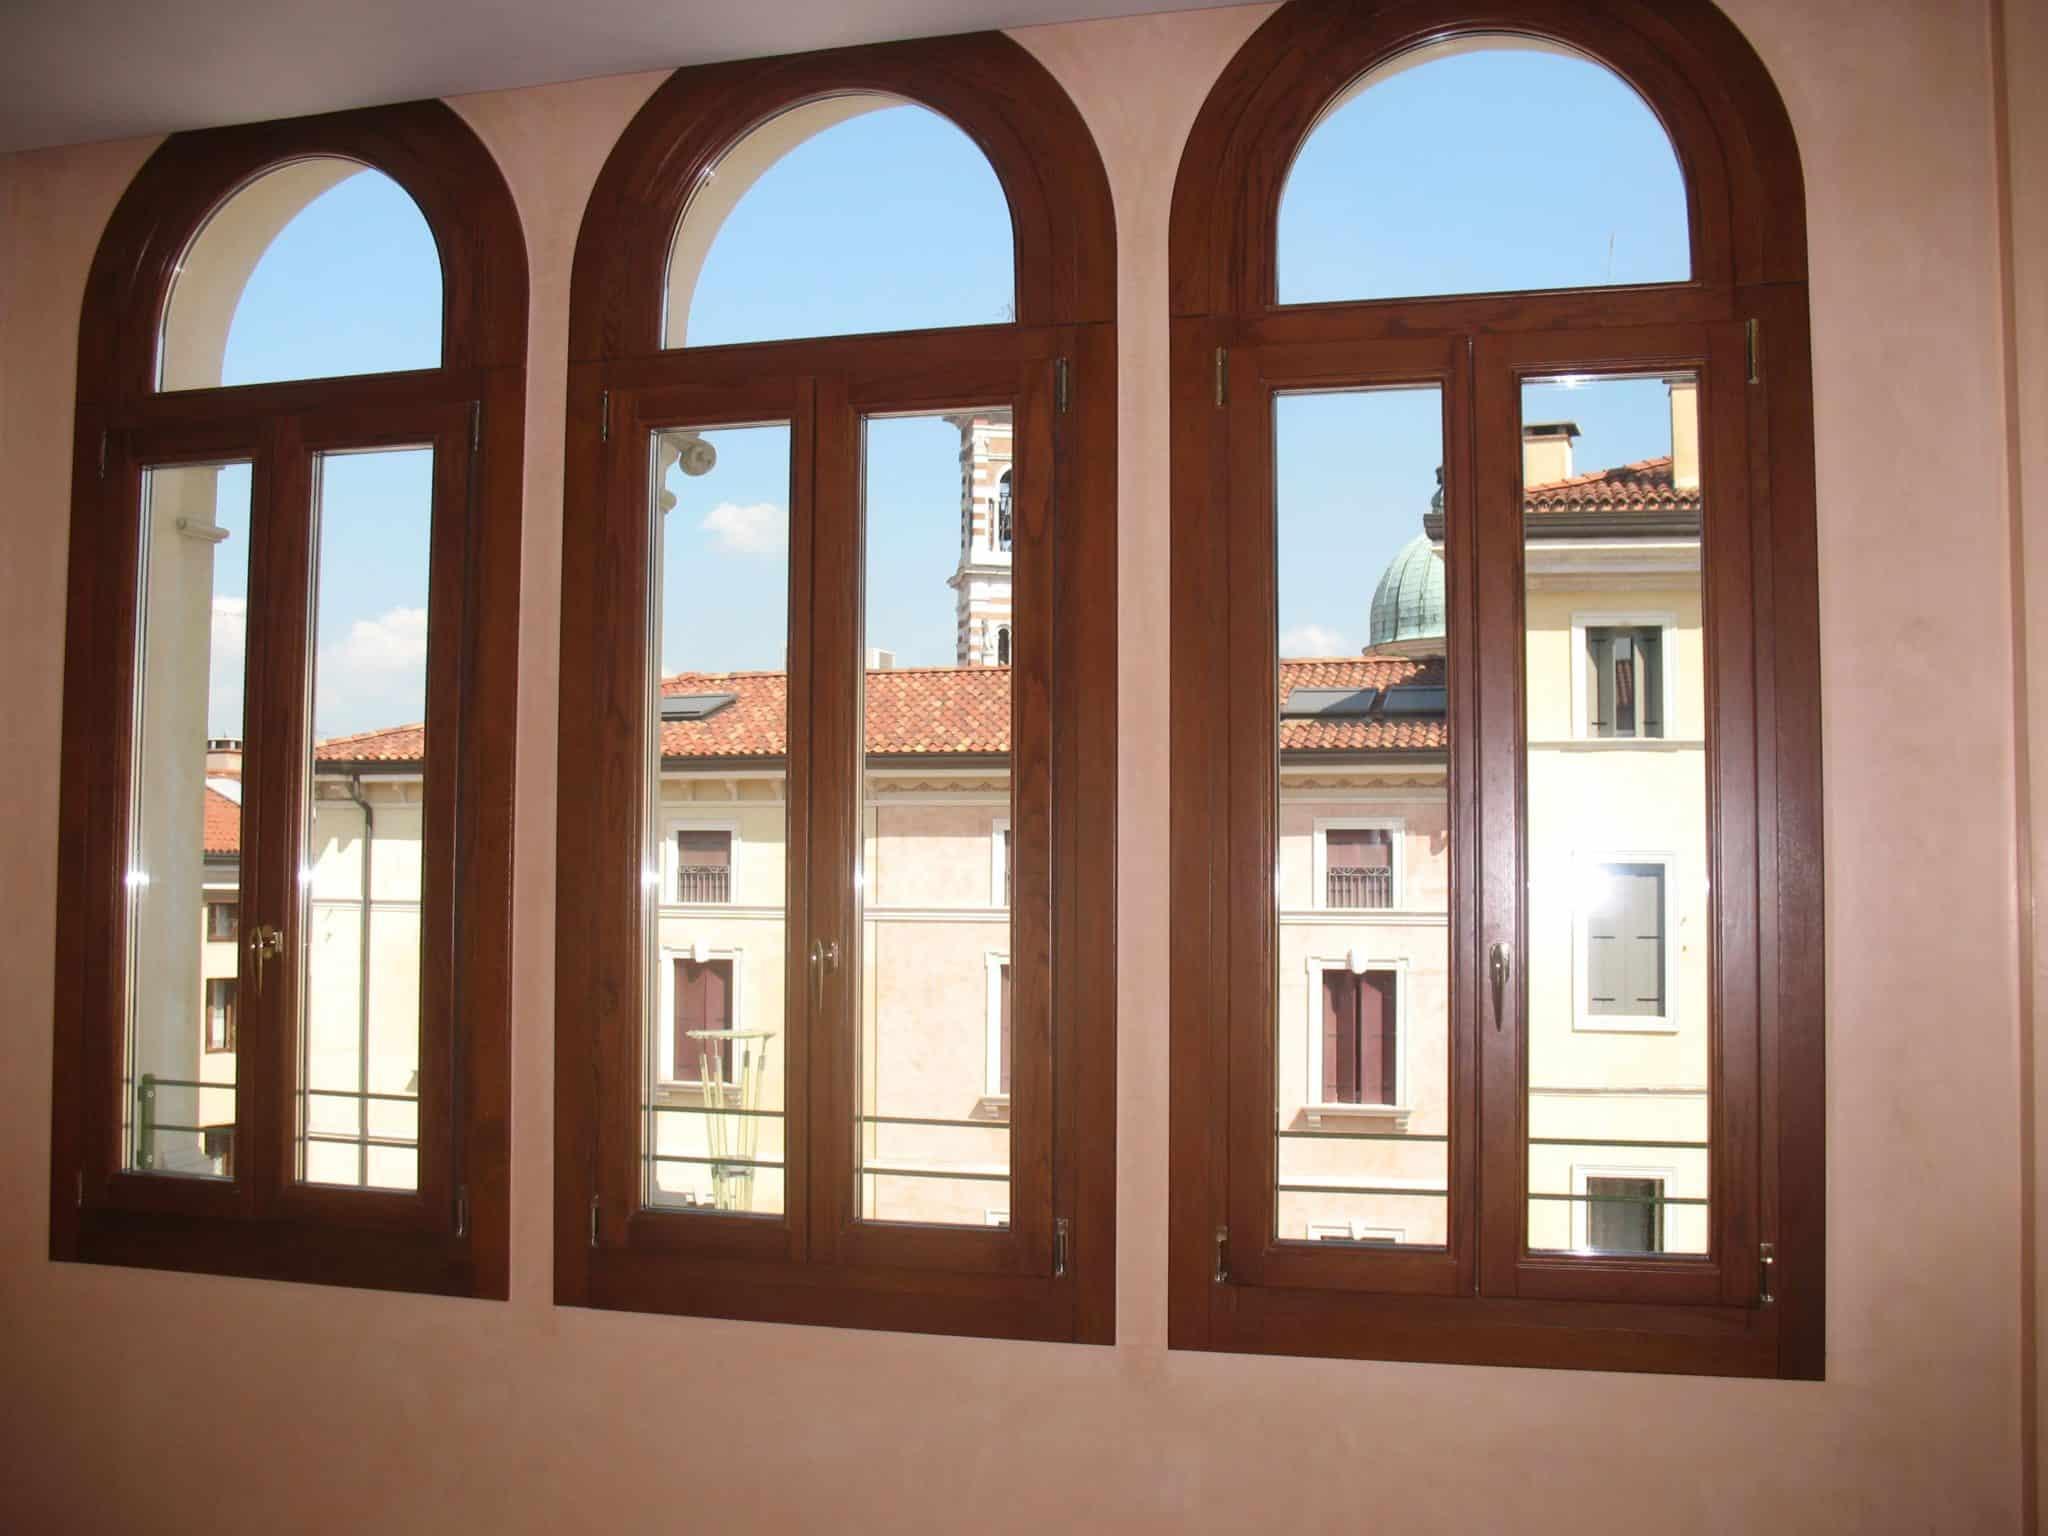 ventanas mediopunto